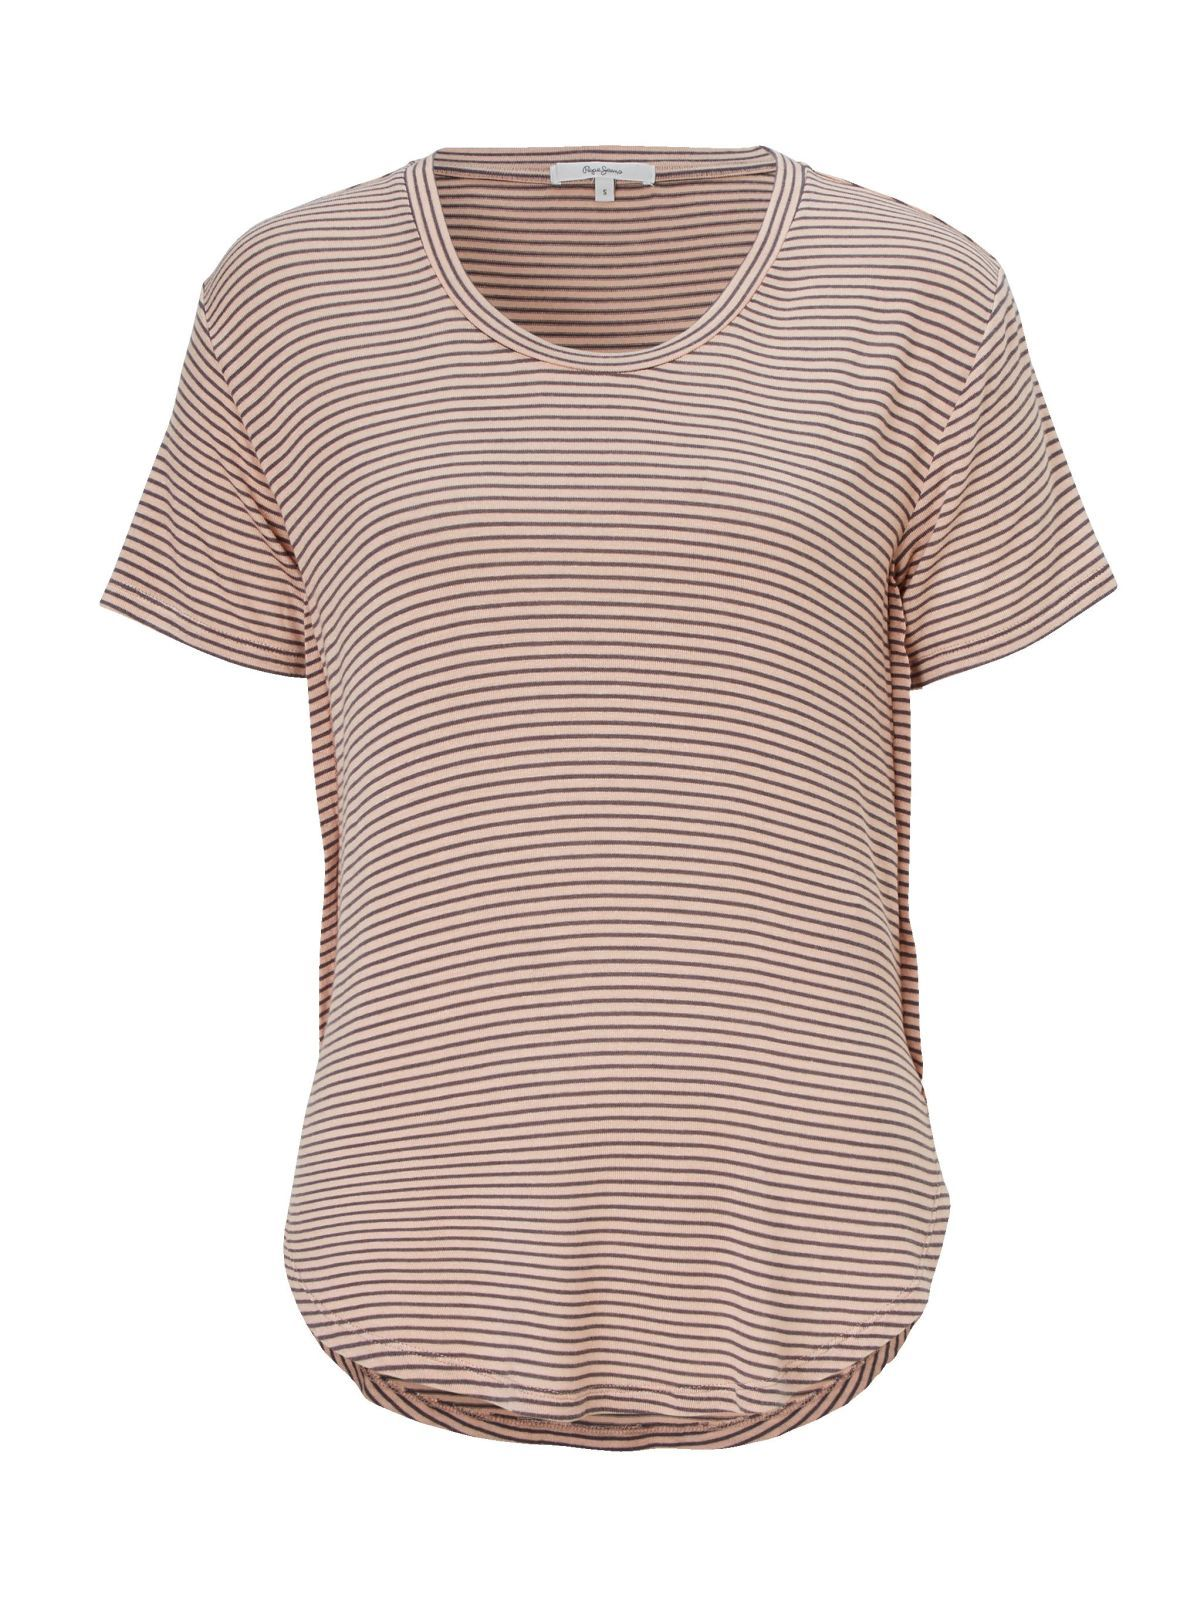 adidas polo t shirts myntra